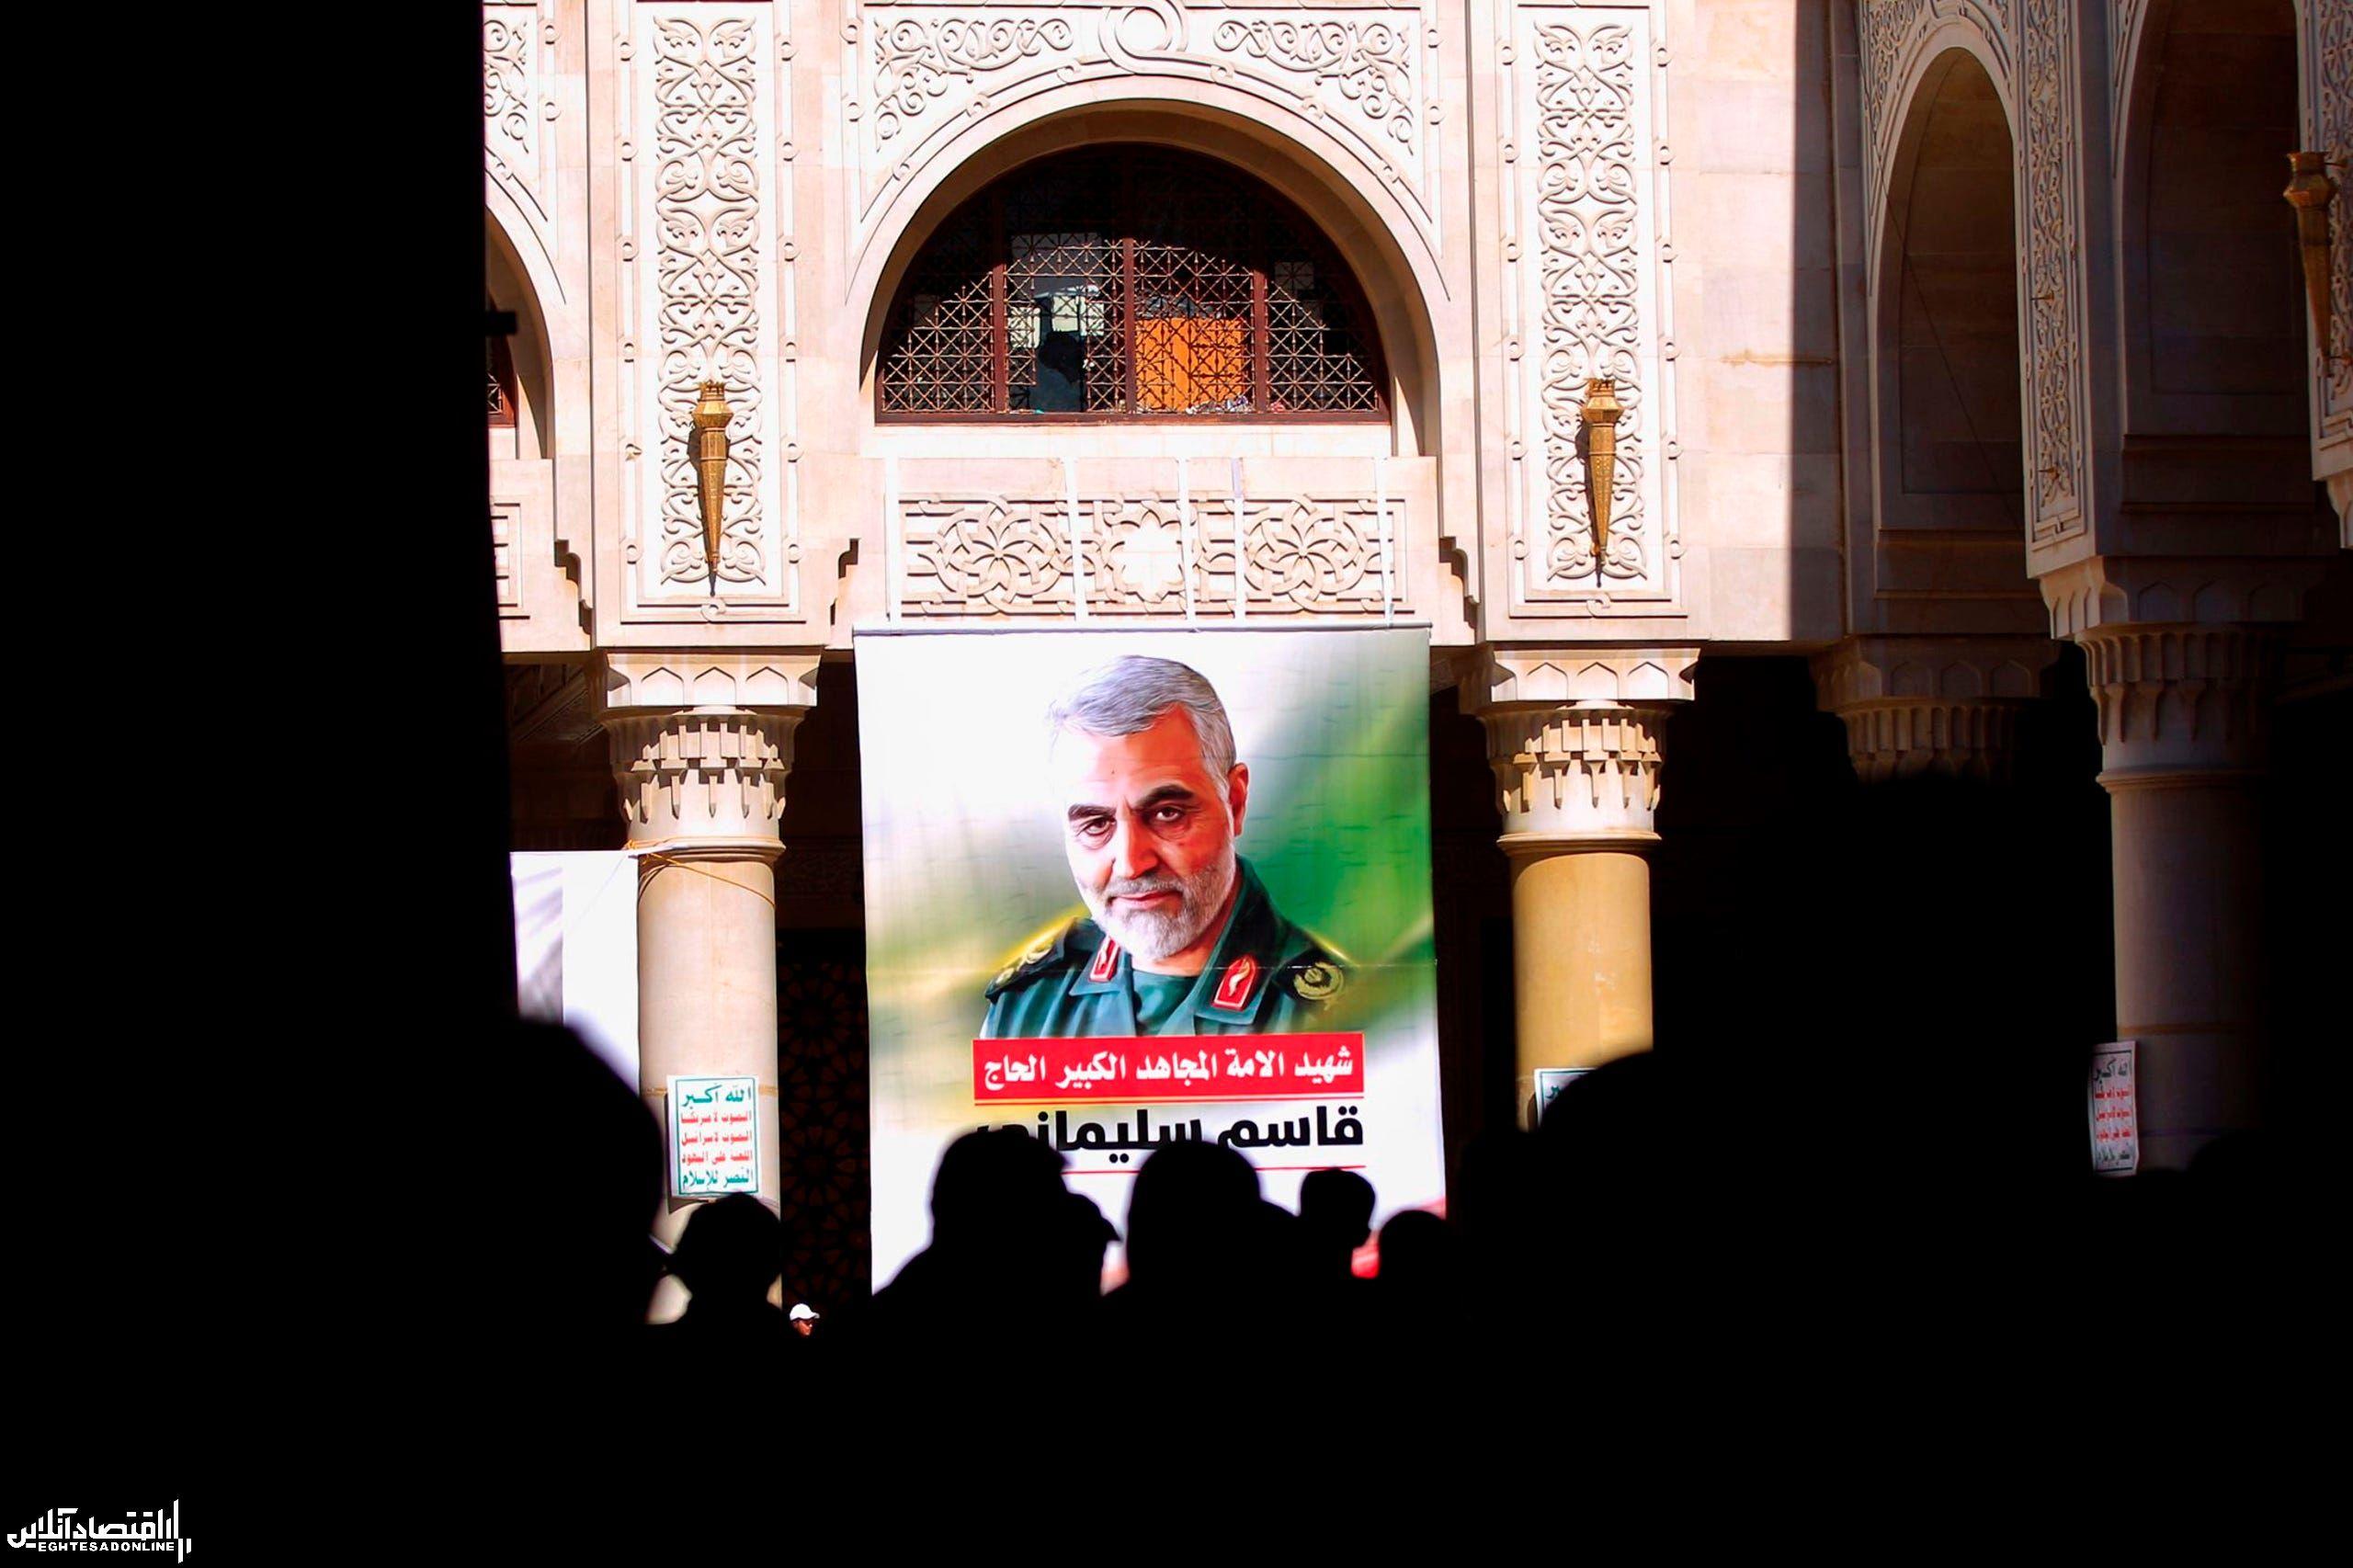 برترین تصاویر خبری ۲۴ ساعت گذشته / 14 دی